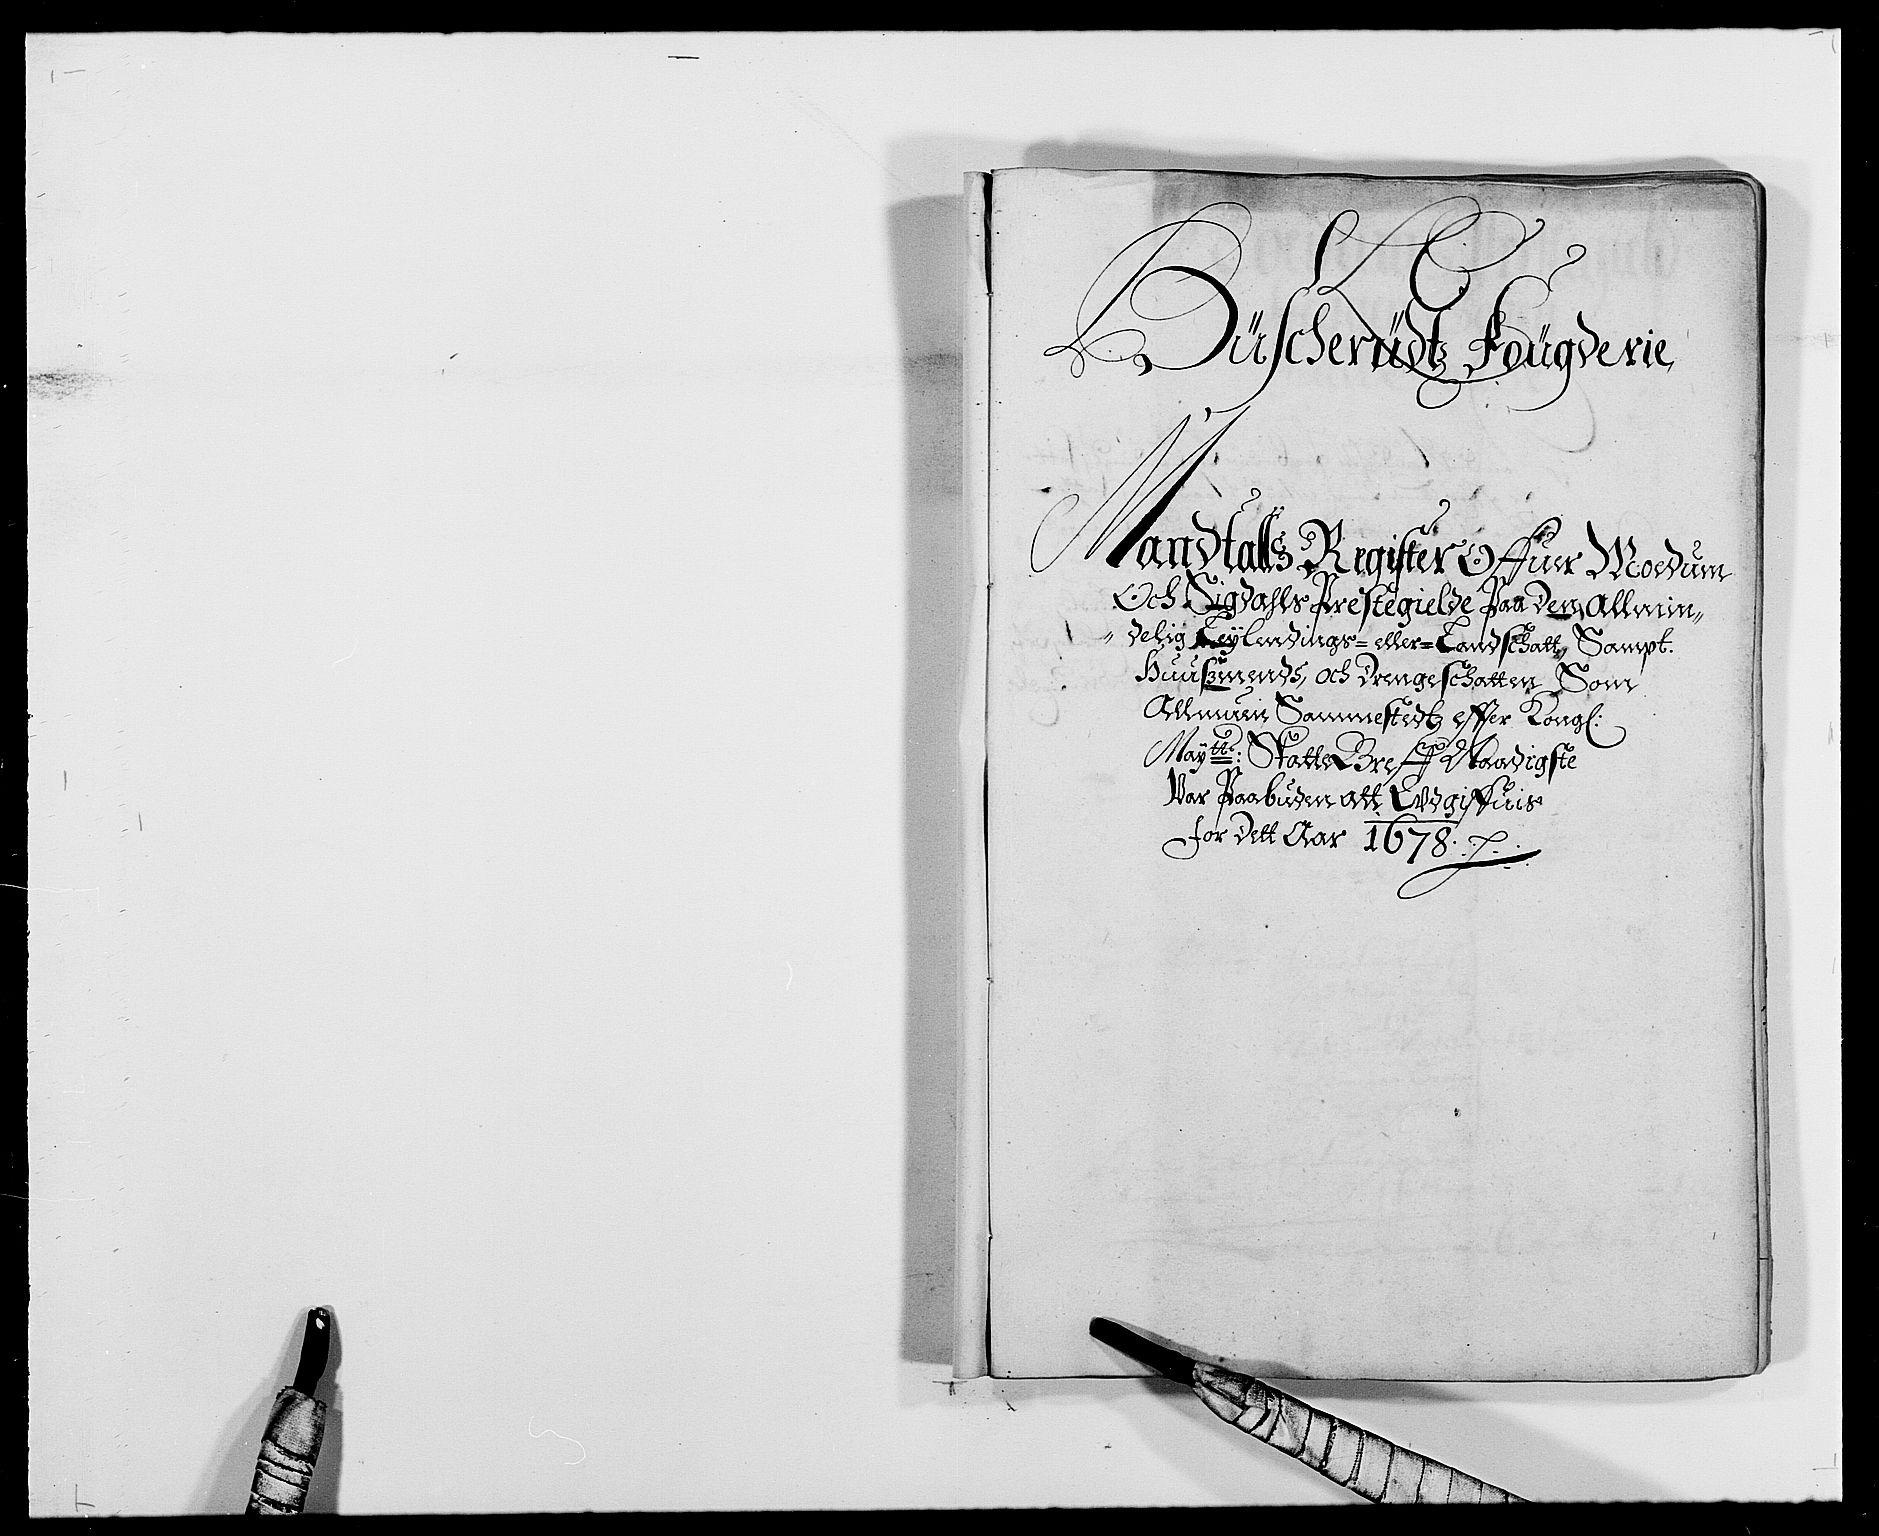 RA, Rentekammeret inntil 1814, Reviderte regnskaper, Fogderegnskap, R25/L1674: Fogderegnskap Buskerud, 1678-1681, s. 41